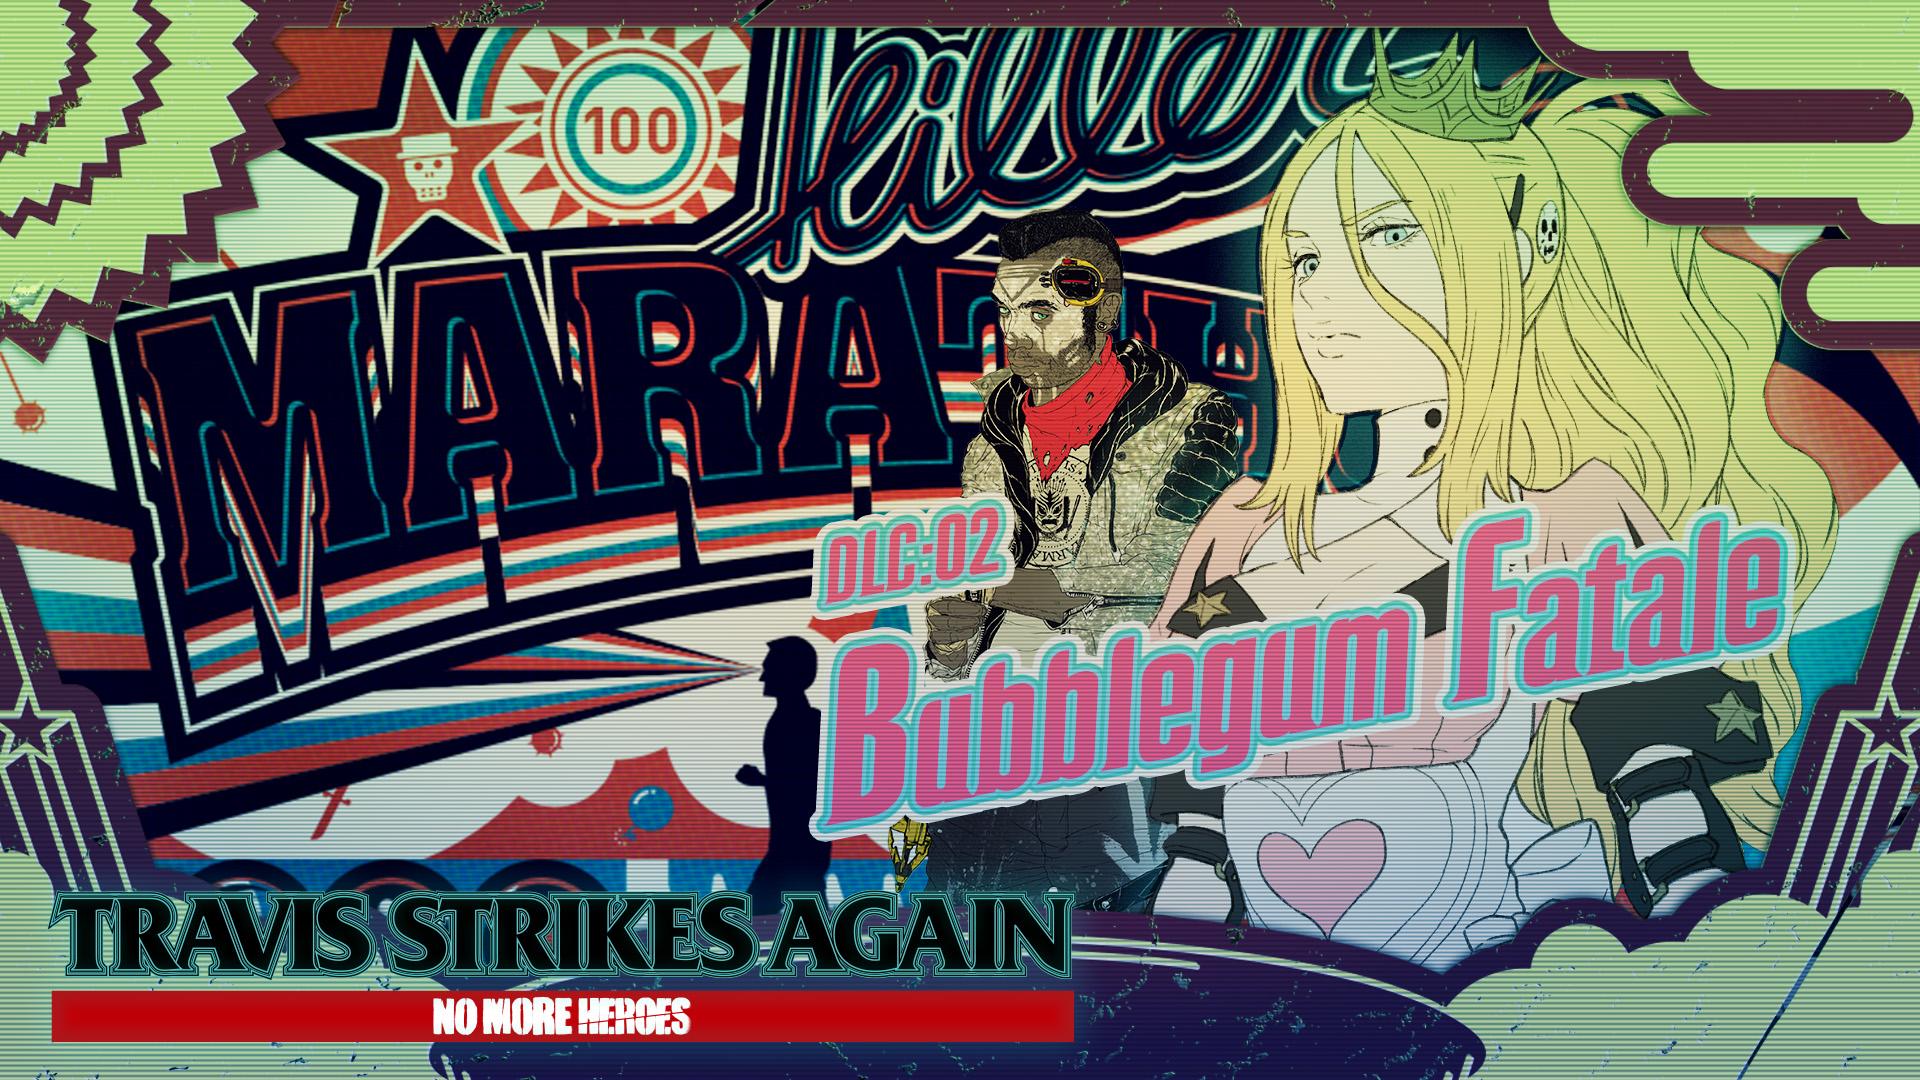 [Switch] Travis Strikes Again: No More Heroes DLC Vol. 02: Bubblegum Fatale chega nesta quinta-feira; Trailer